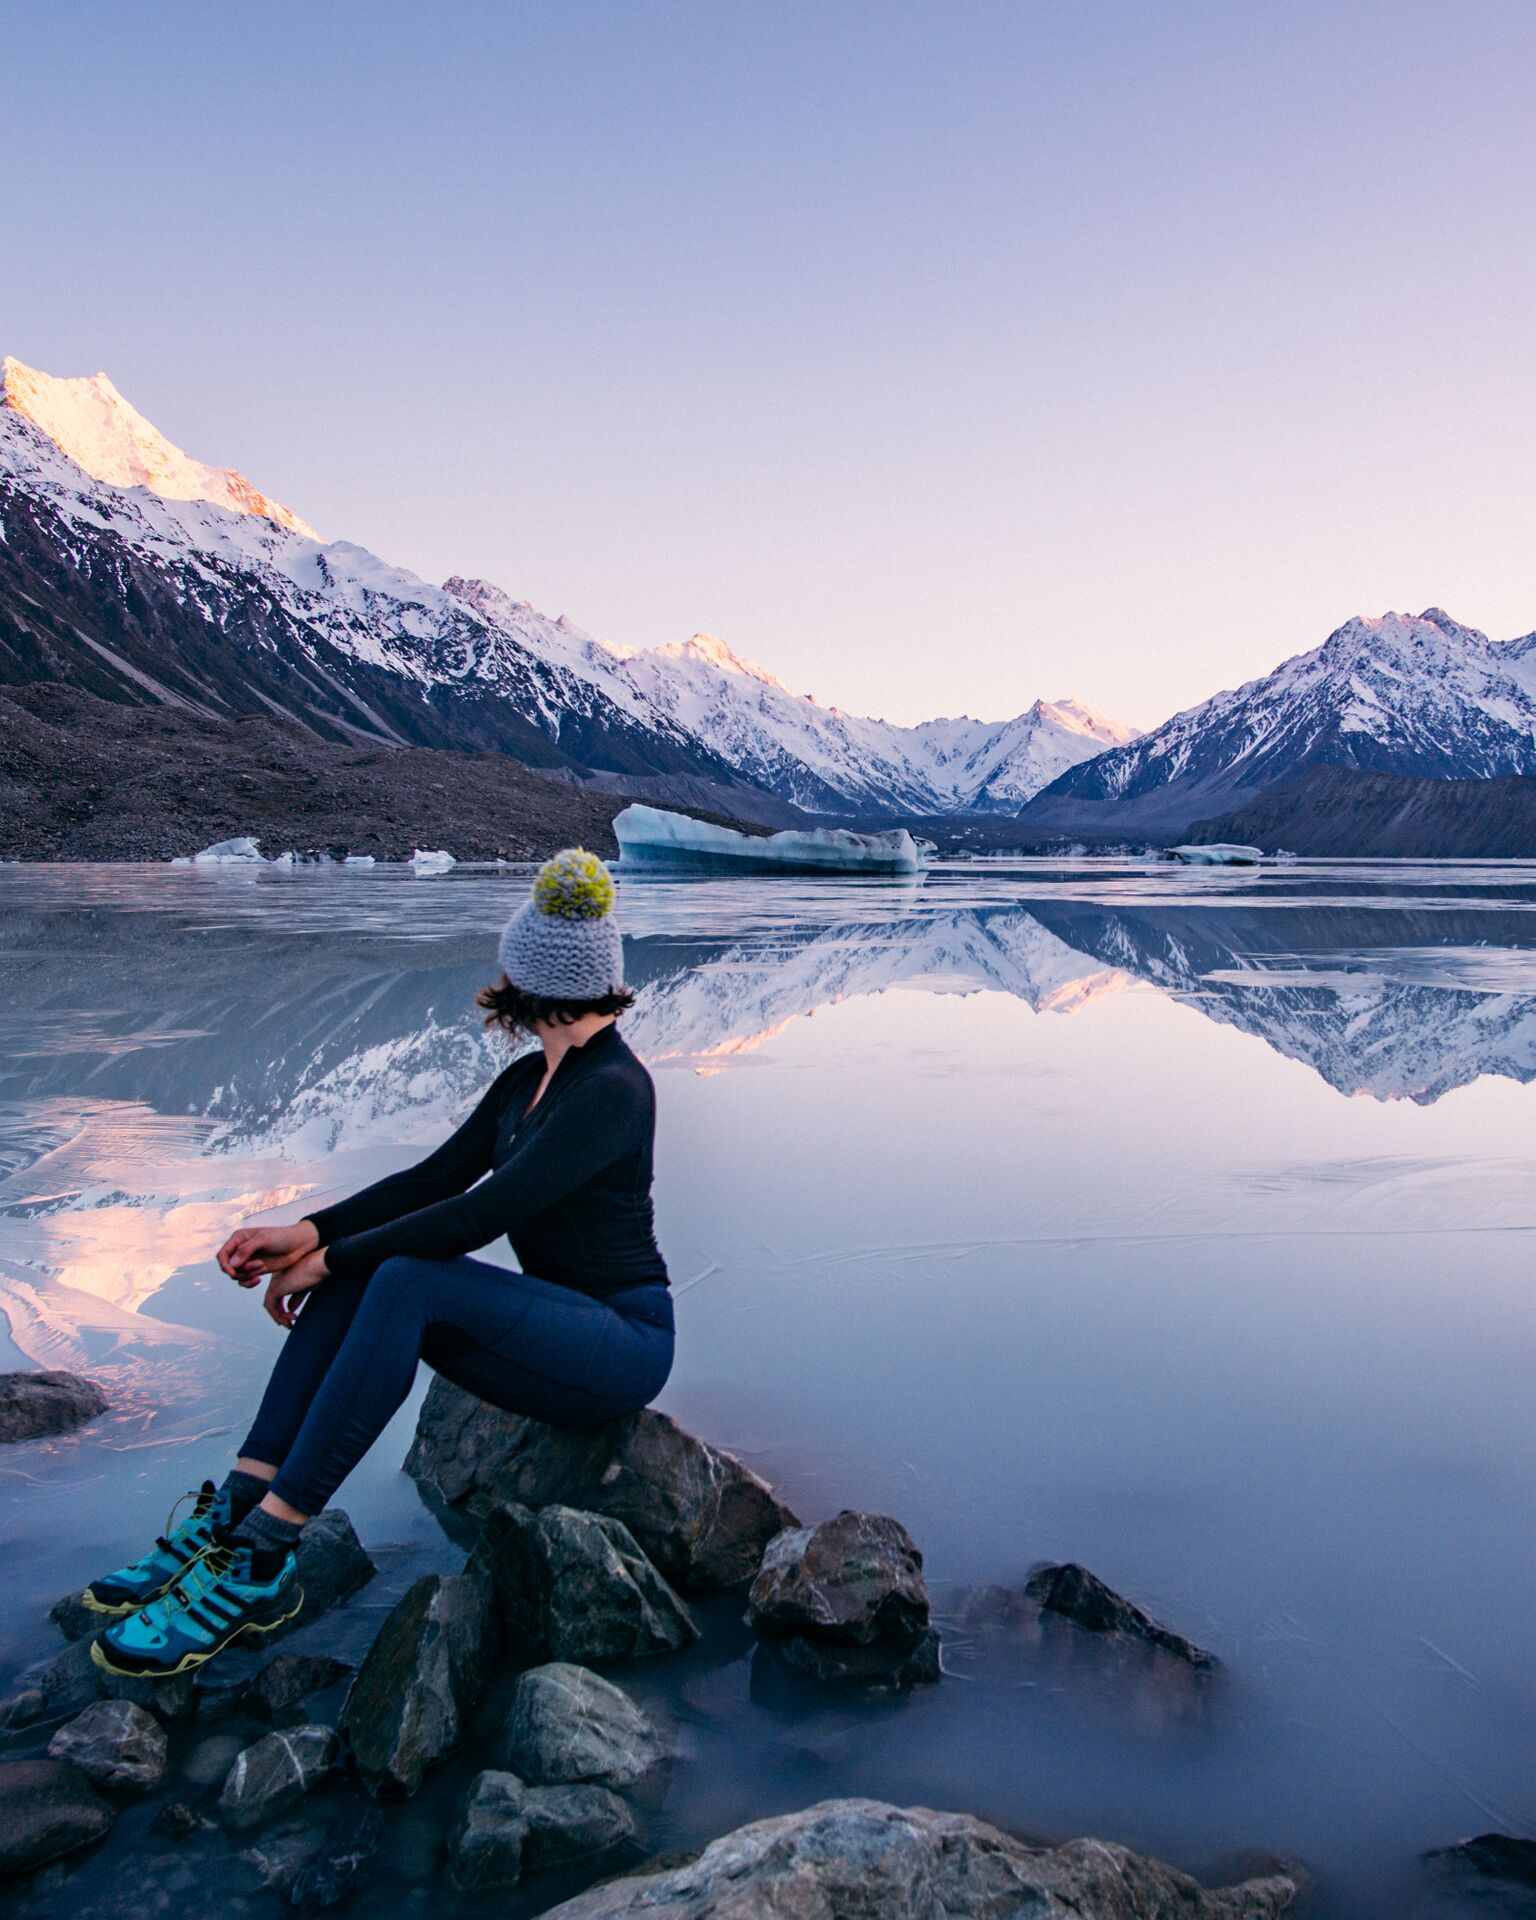 carmen huter new tasman lake 1 819x1024 - Carmen Huter Shares How to Plan Your Next Trip Like a Pro